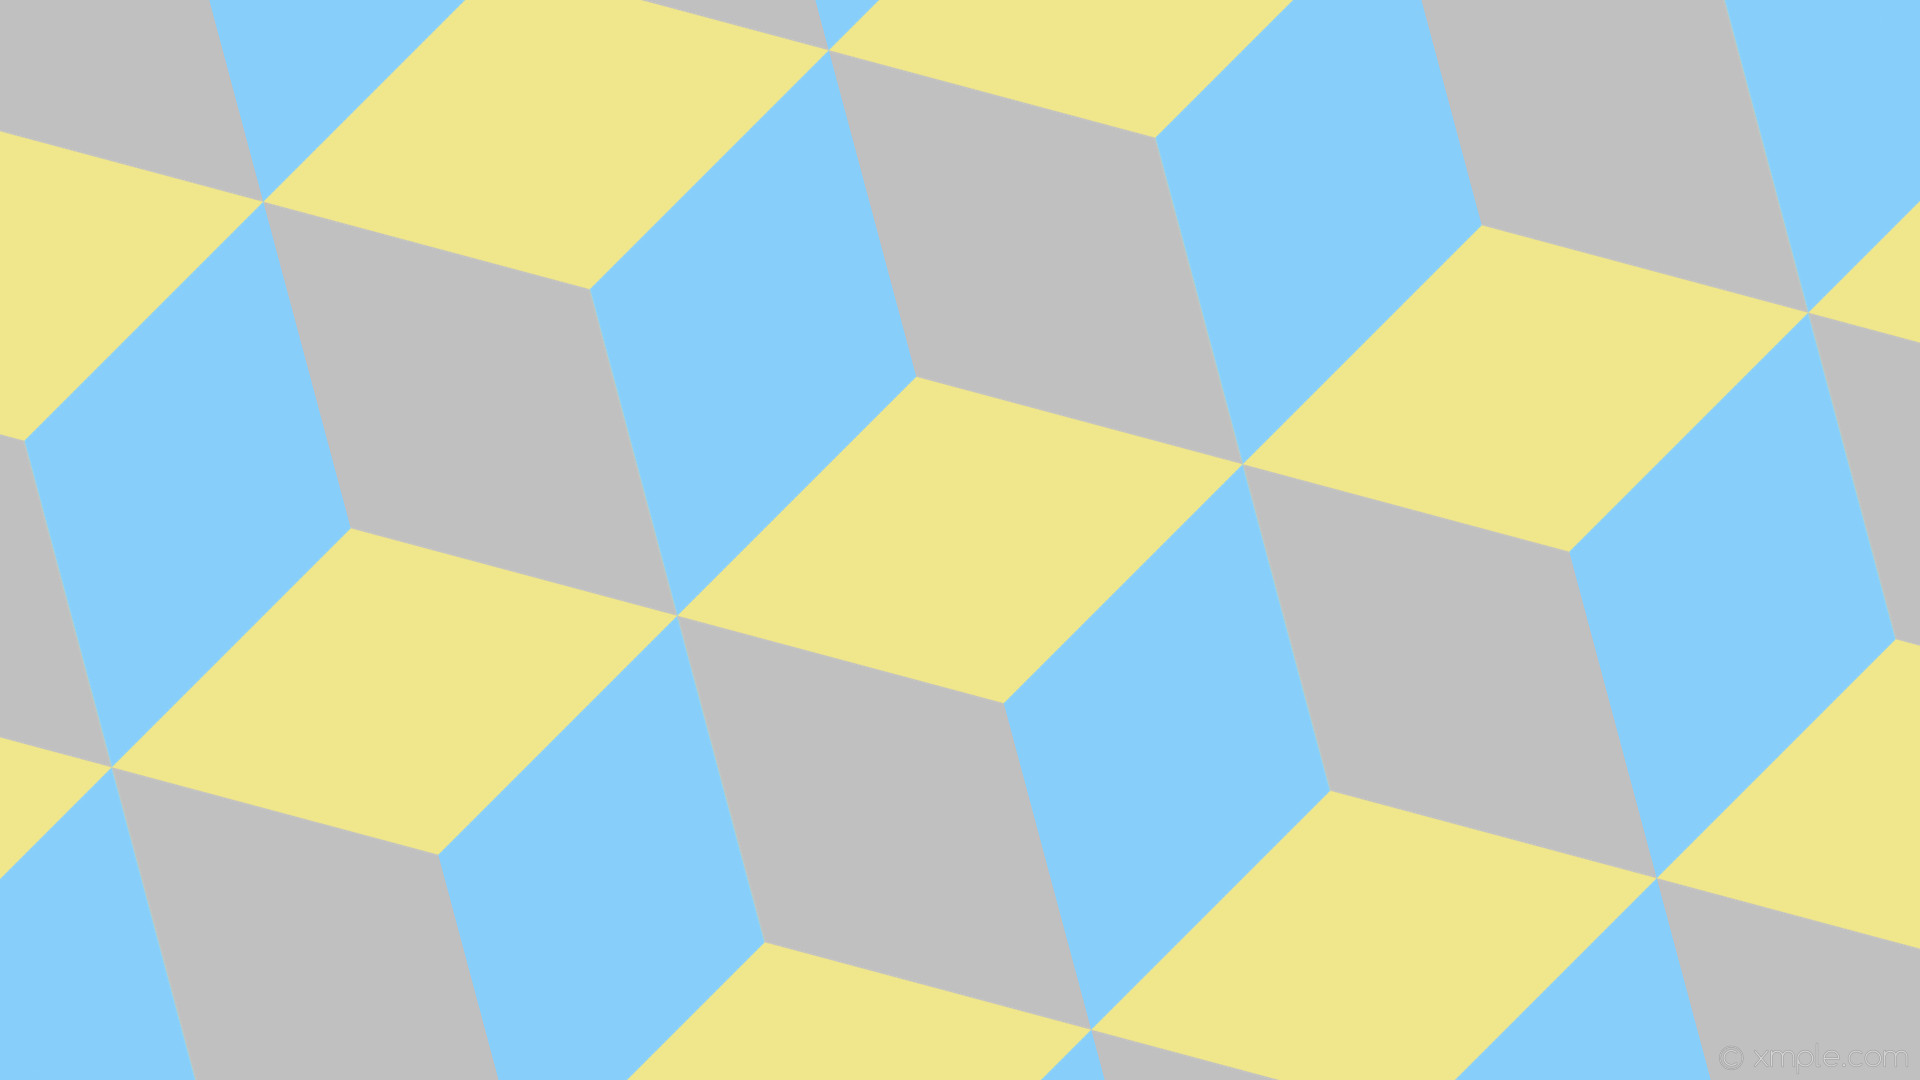 wallpaper blue grey yellow 3d cubes khaki silver light sky blue #f0e68c  #c0c0c0 #